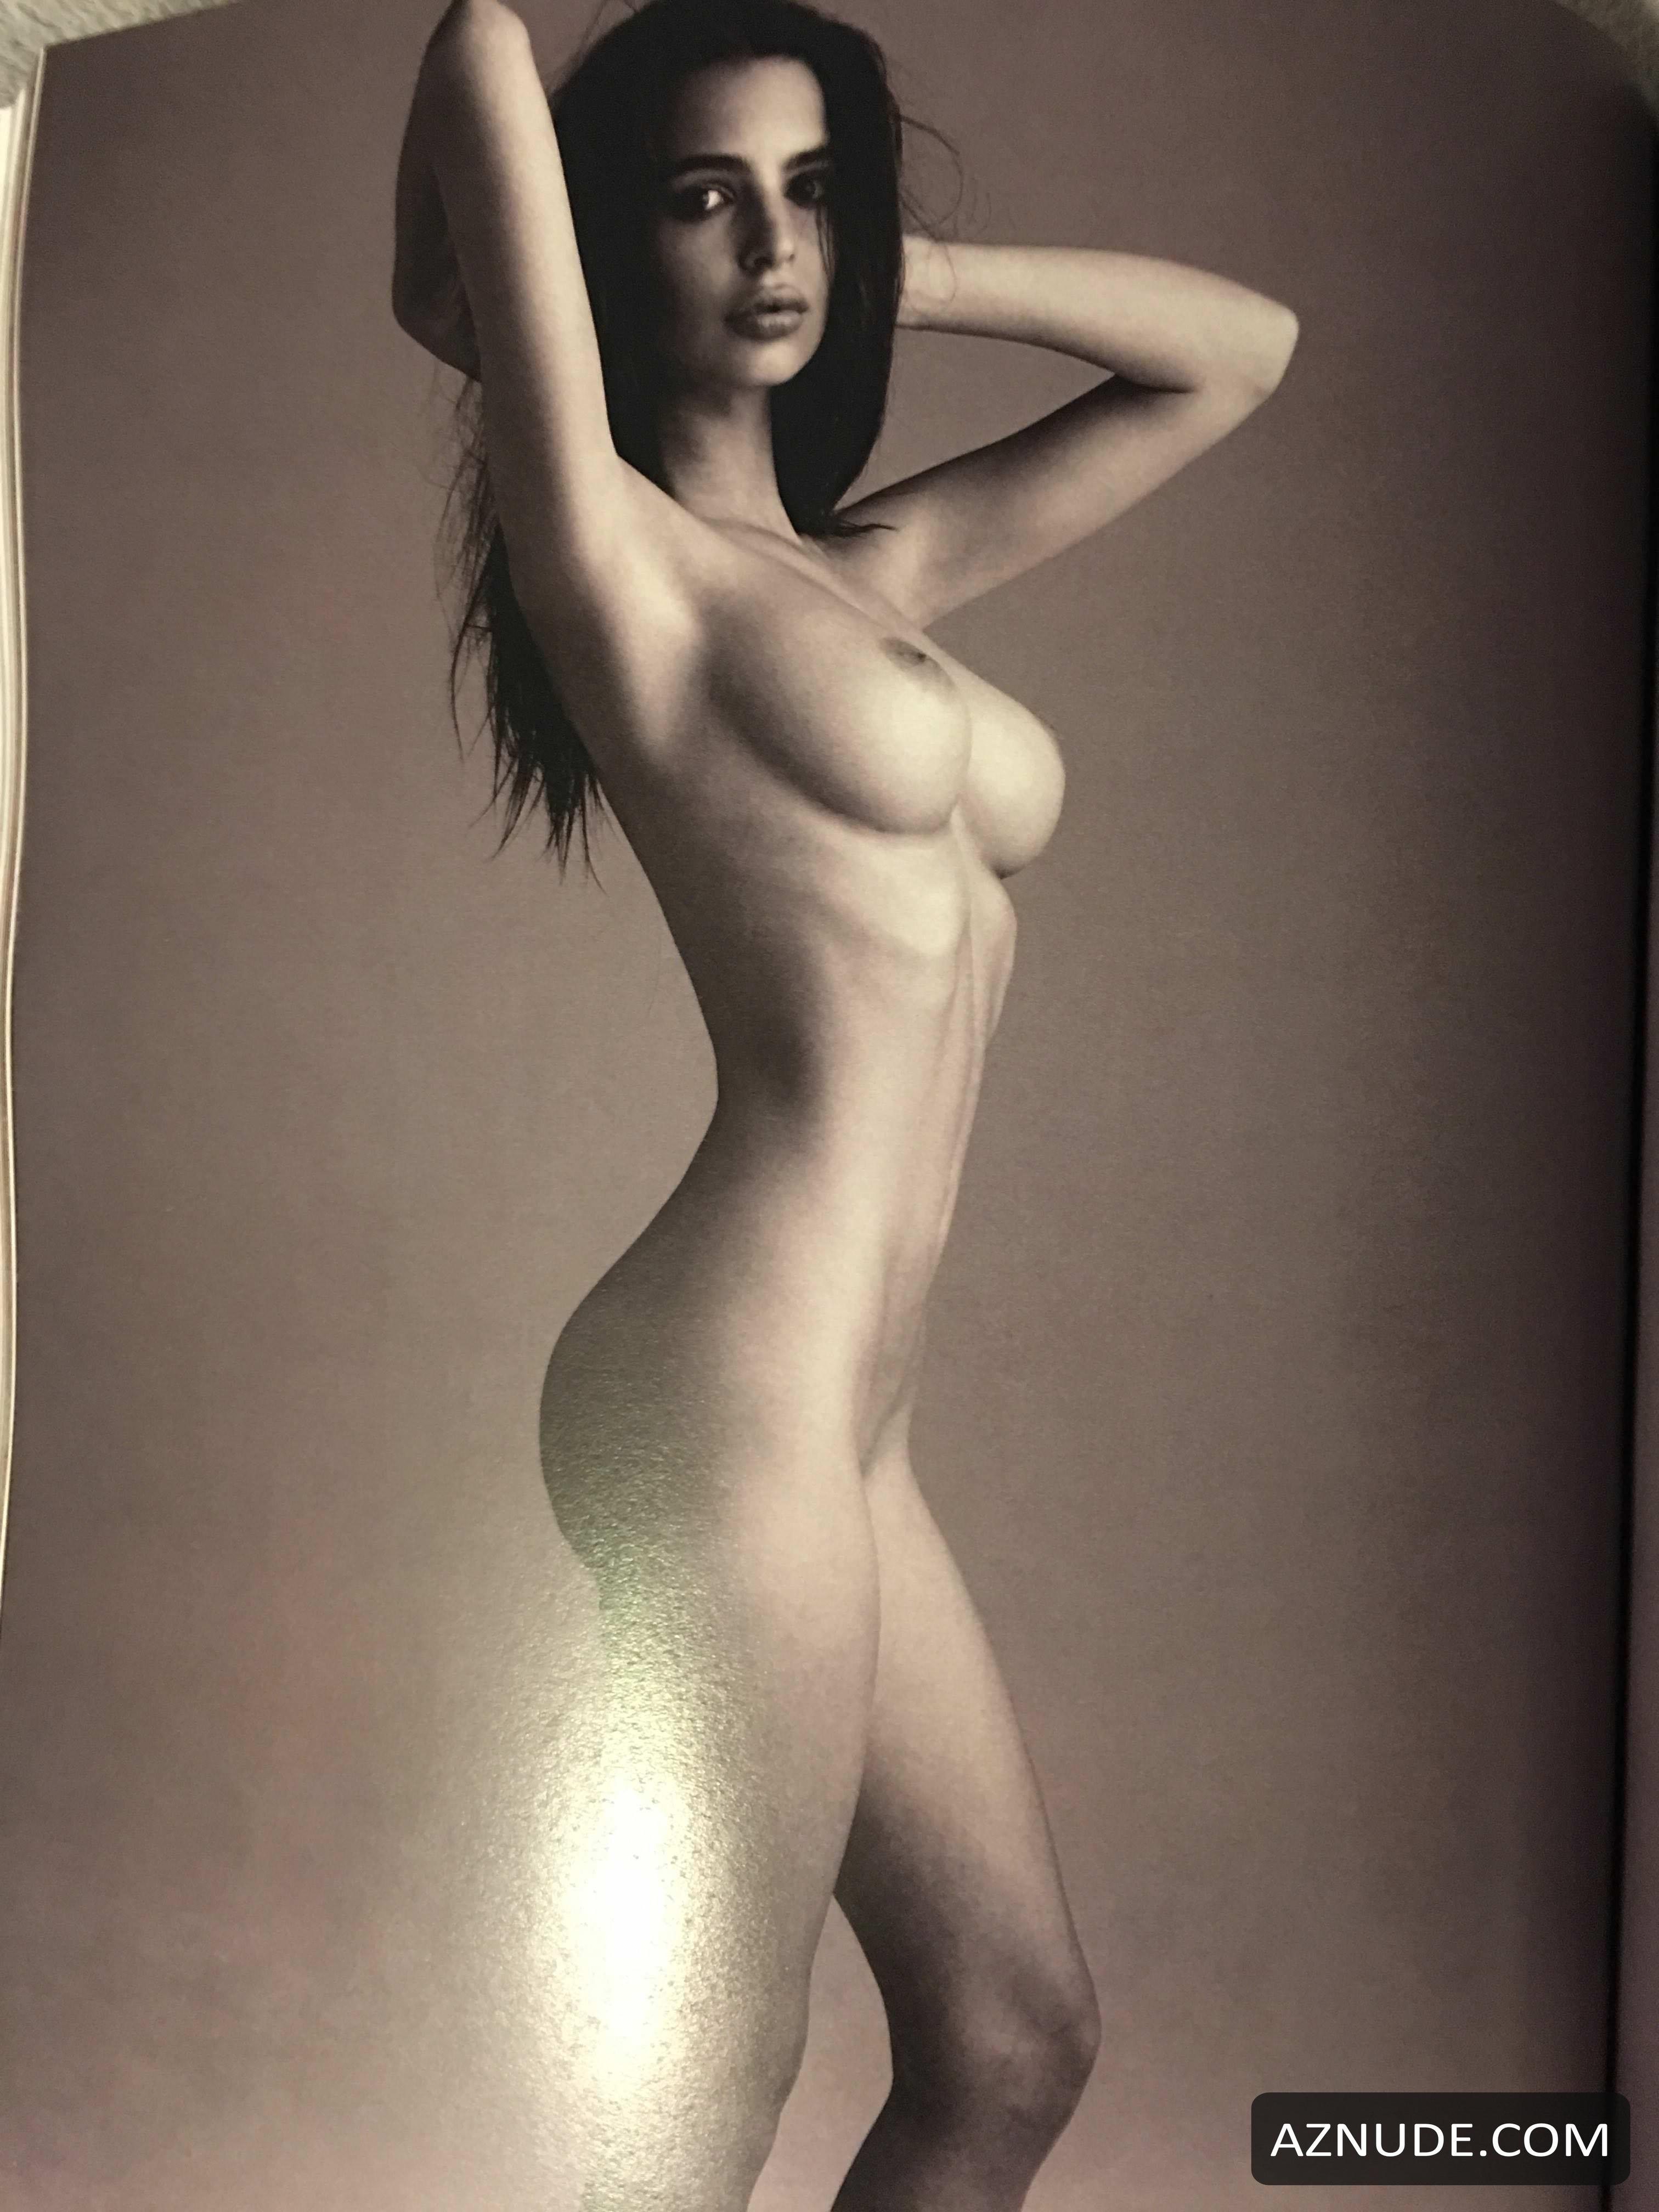 Emily Ratajkowski Naked By Steve Shaw From Treats Magazine -6279